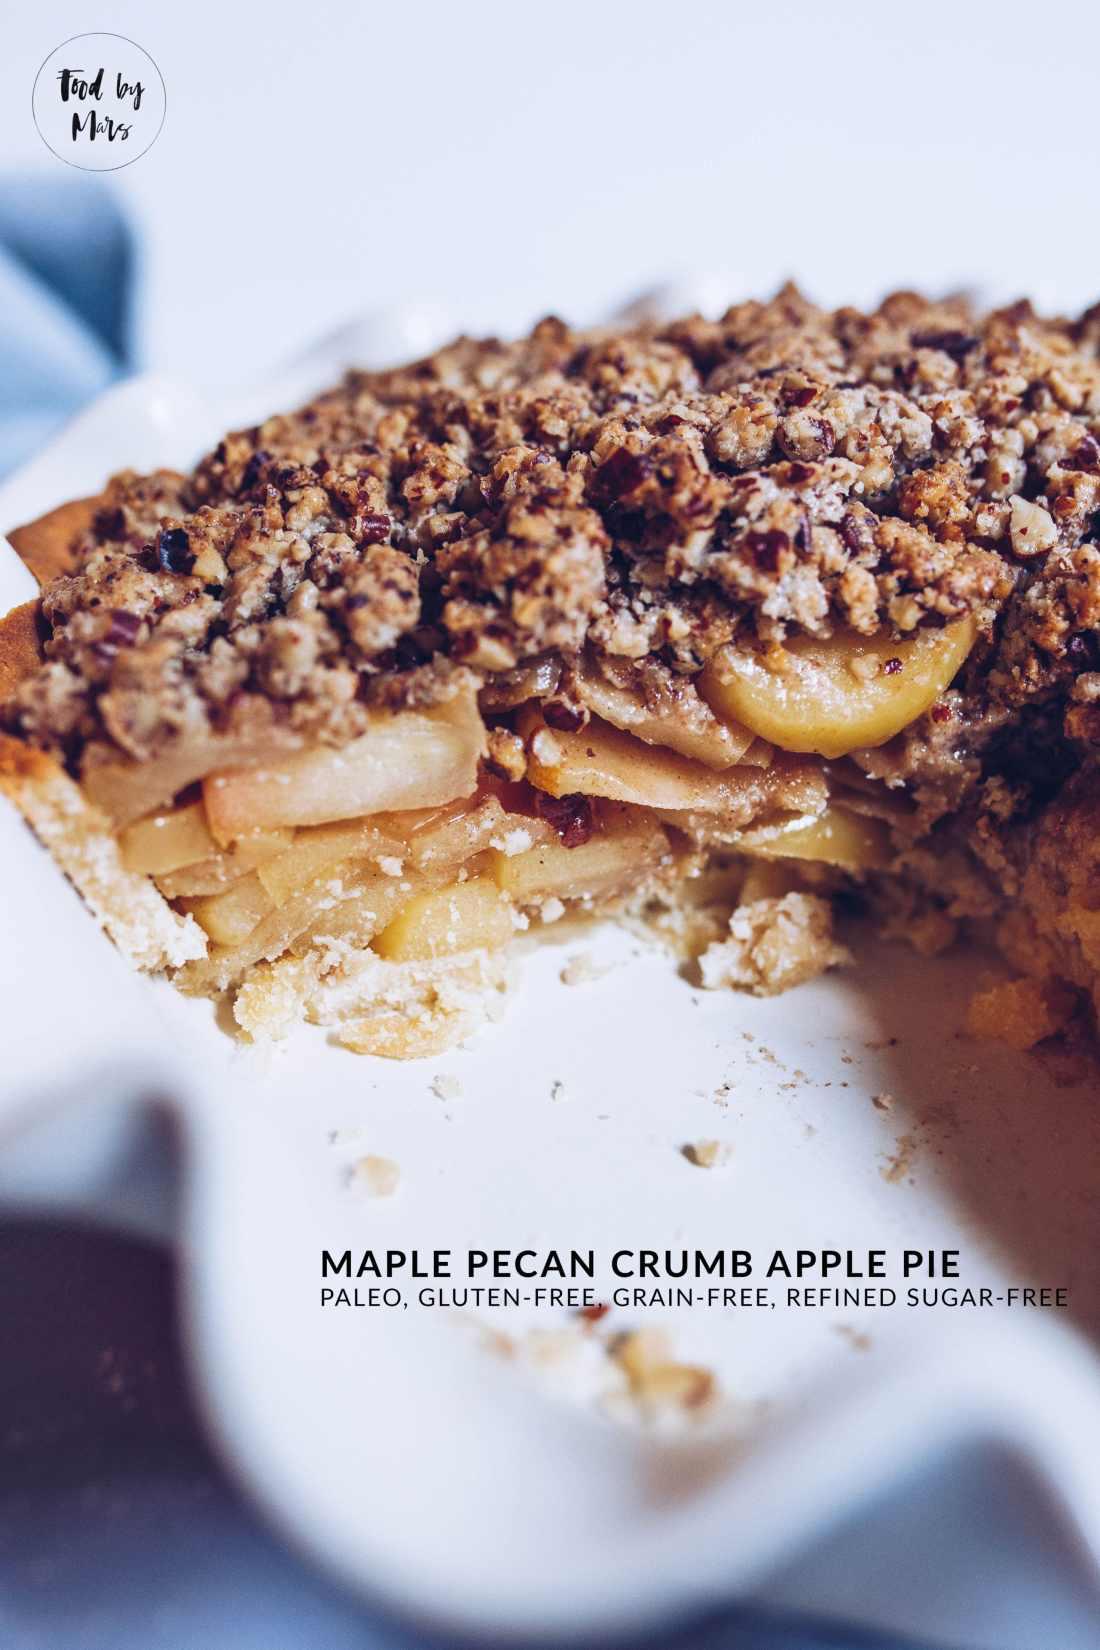 Paleo Maple Pecan Crumb Apple Pie via Food by Mars (paleo, gluten-free, refined sugar-free)